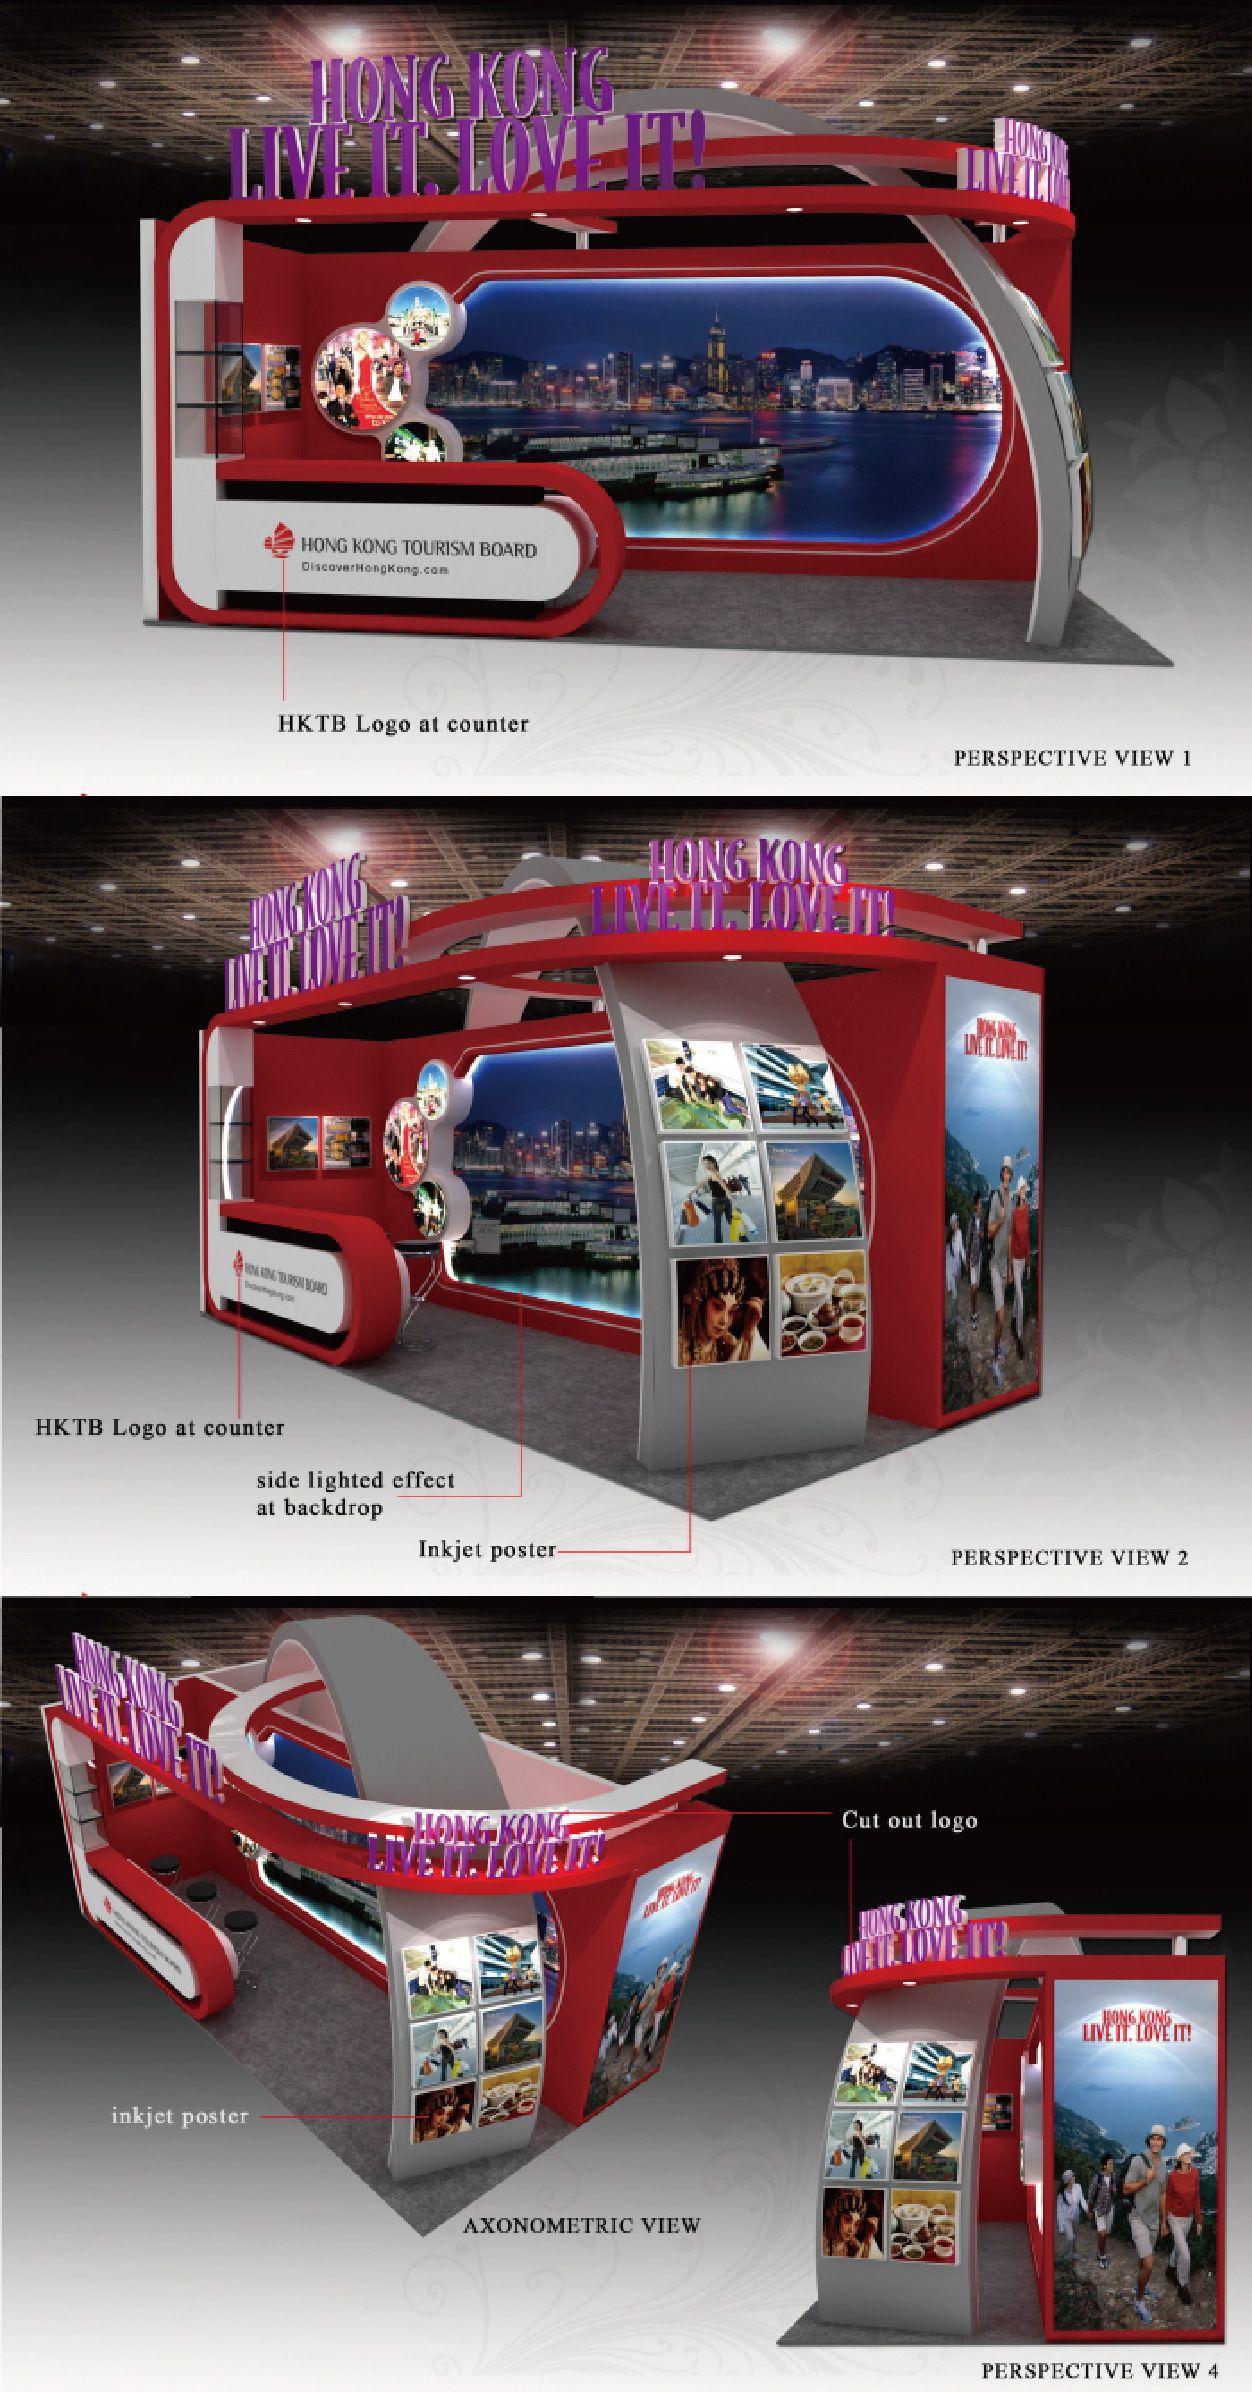 Exhibition Booth Exhibition Stands Stand Design Stalls